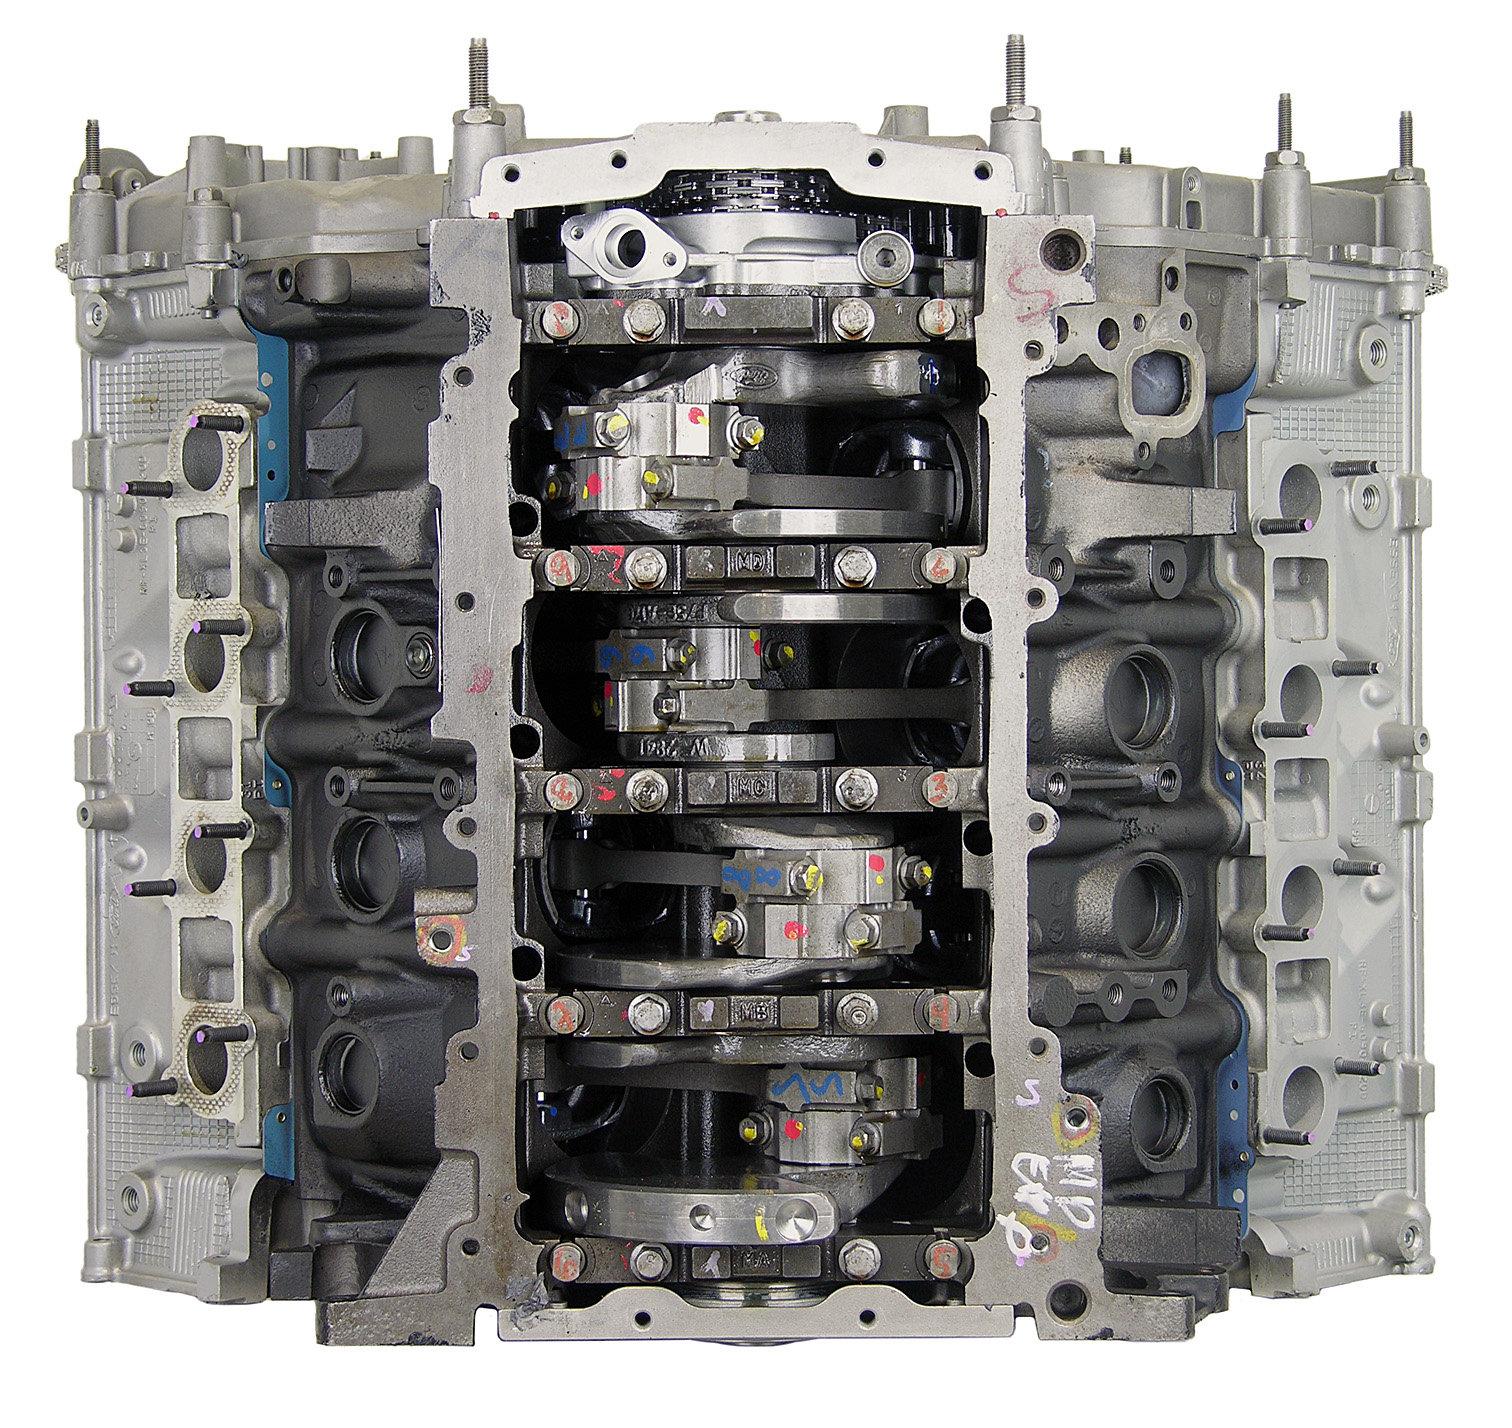 1999-2001 Ford 5.4-Liter V8 Triton Engine